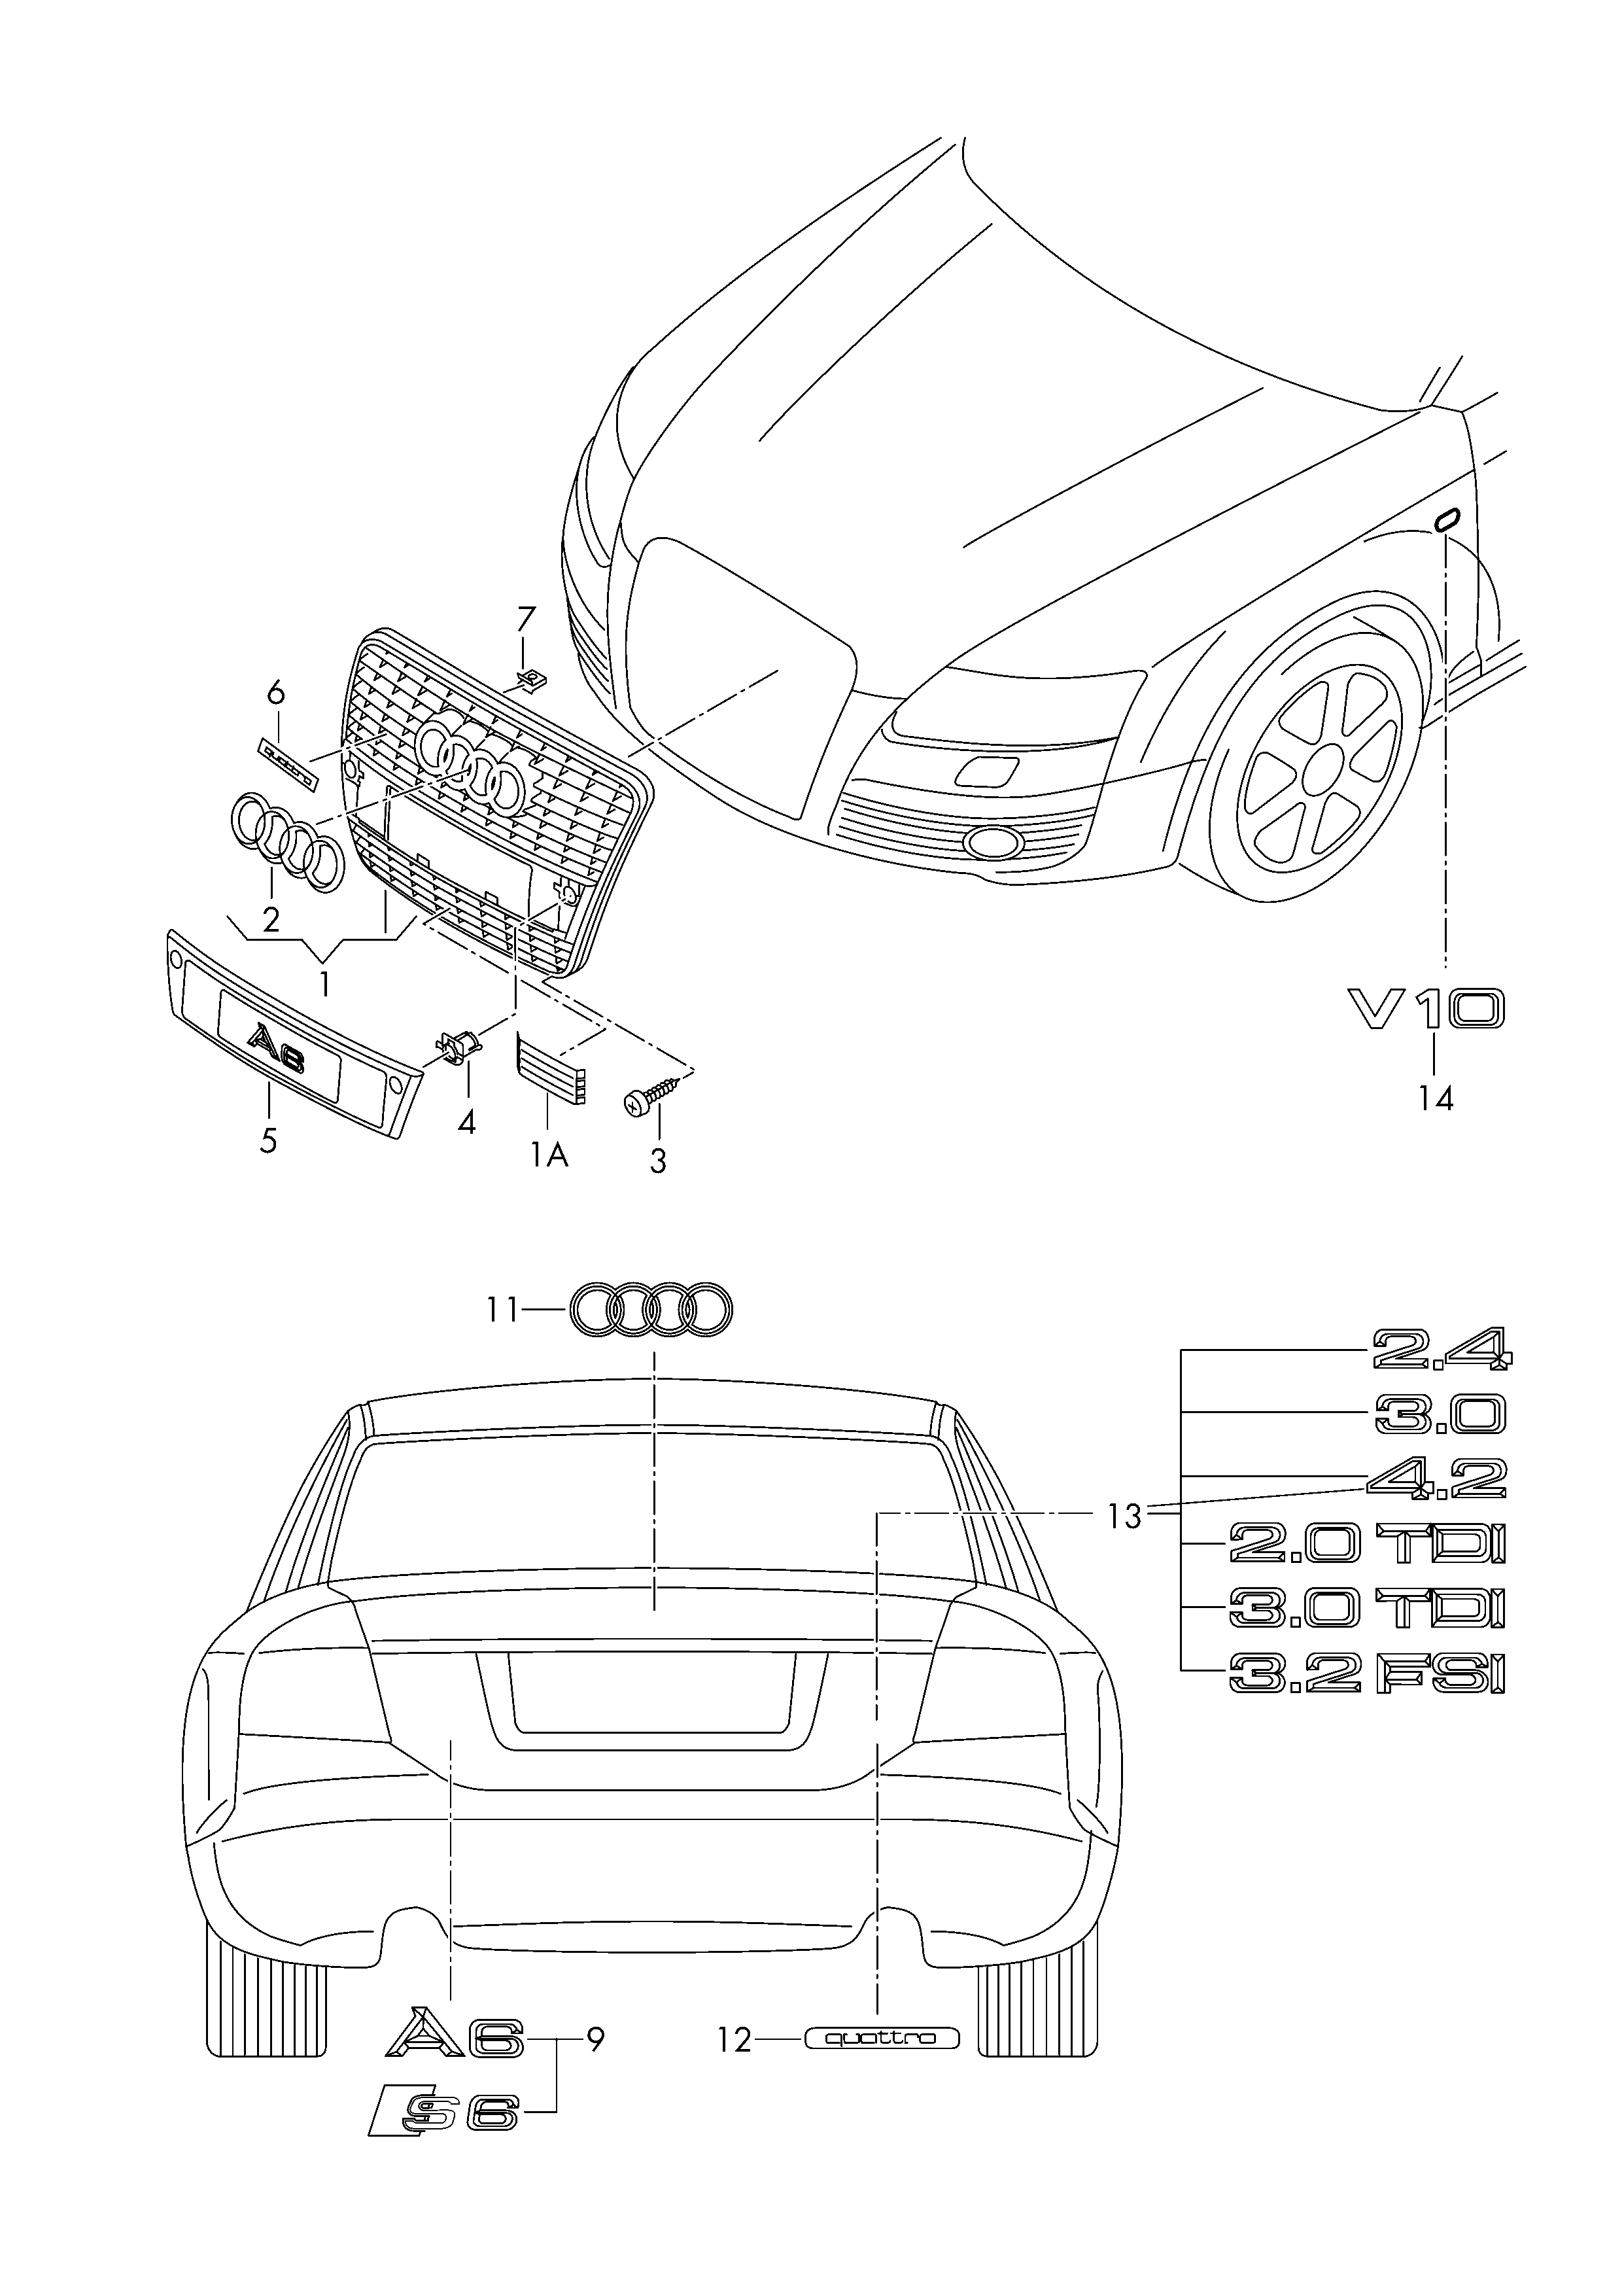 audi a6 avant 2009 2011 inscriptions lettering radiator 2018 Audi A6 Redesign audi a6 avant 2009 2011 vag etka